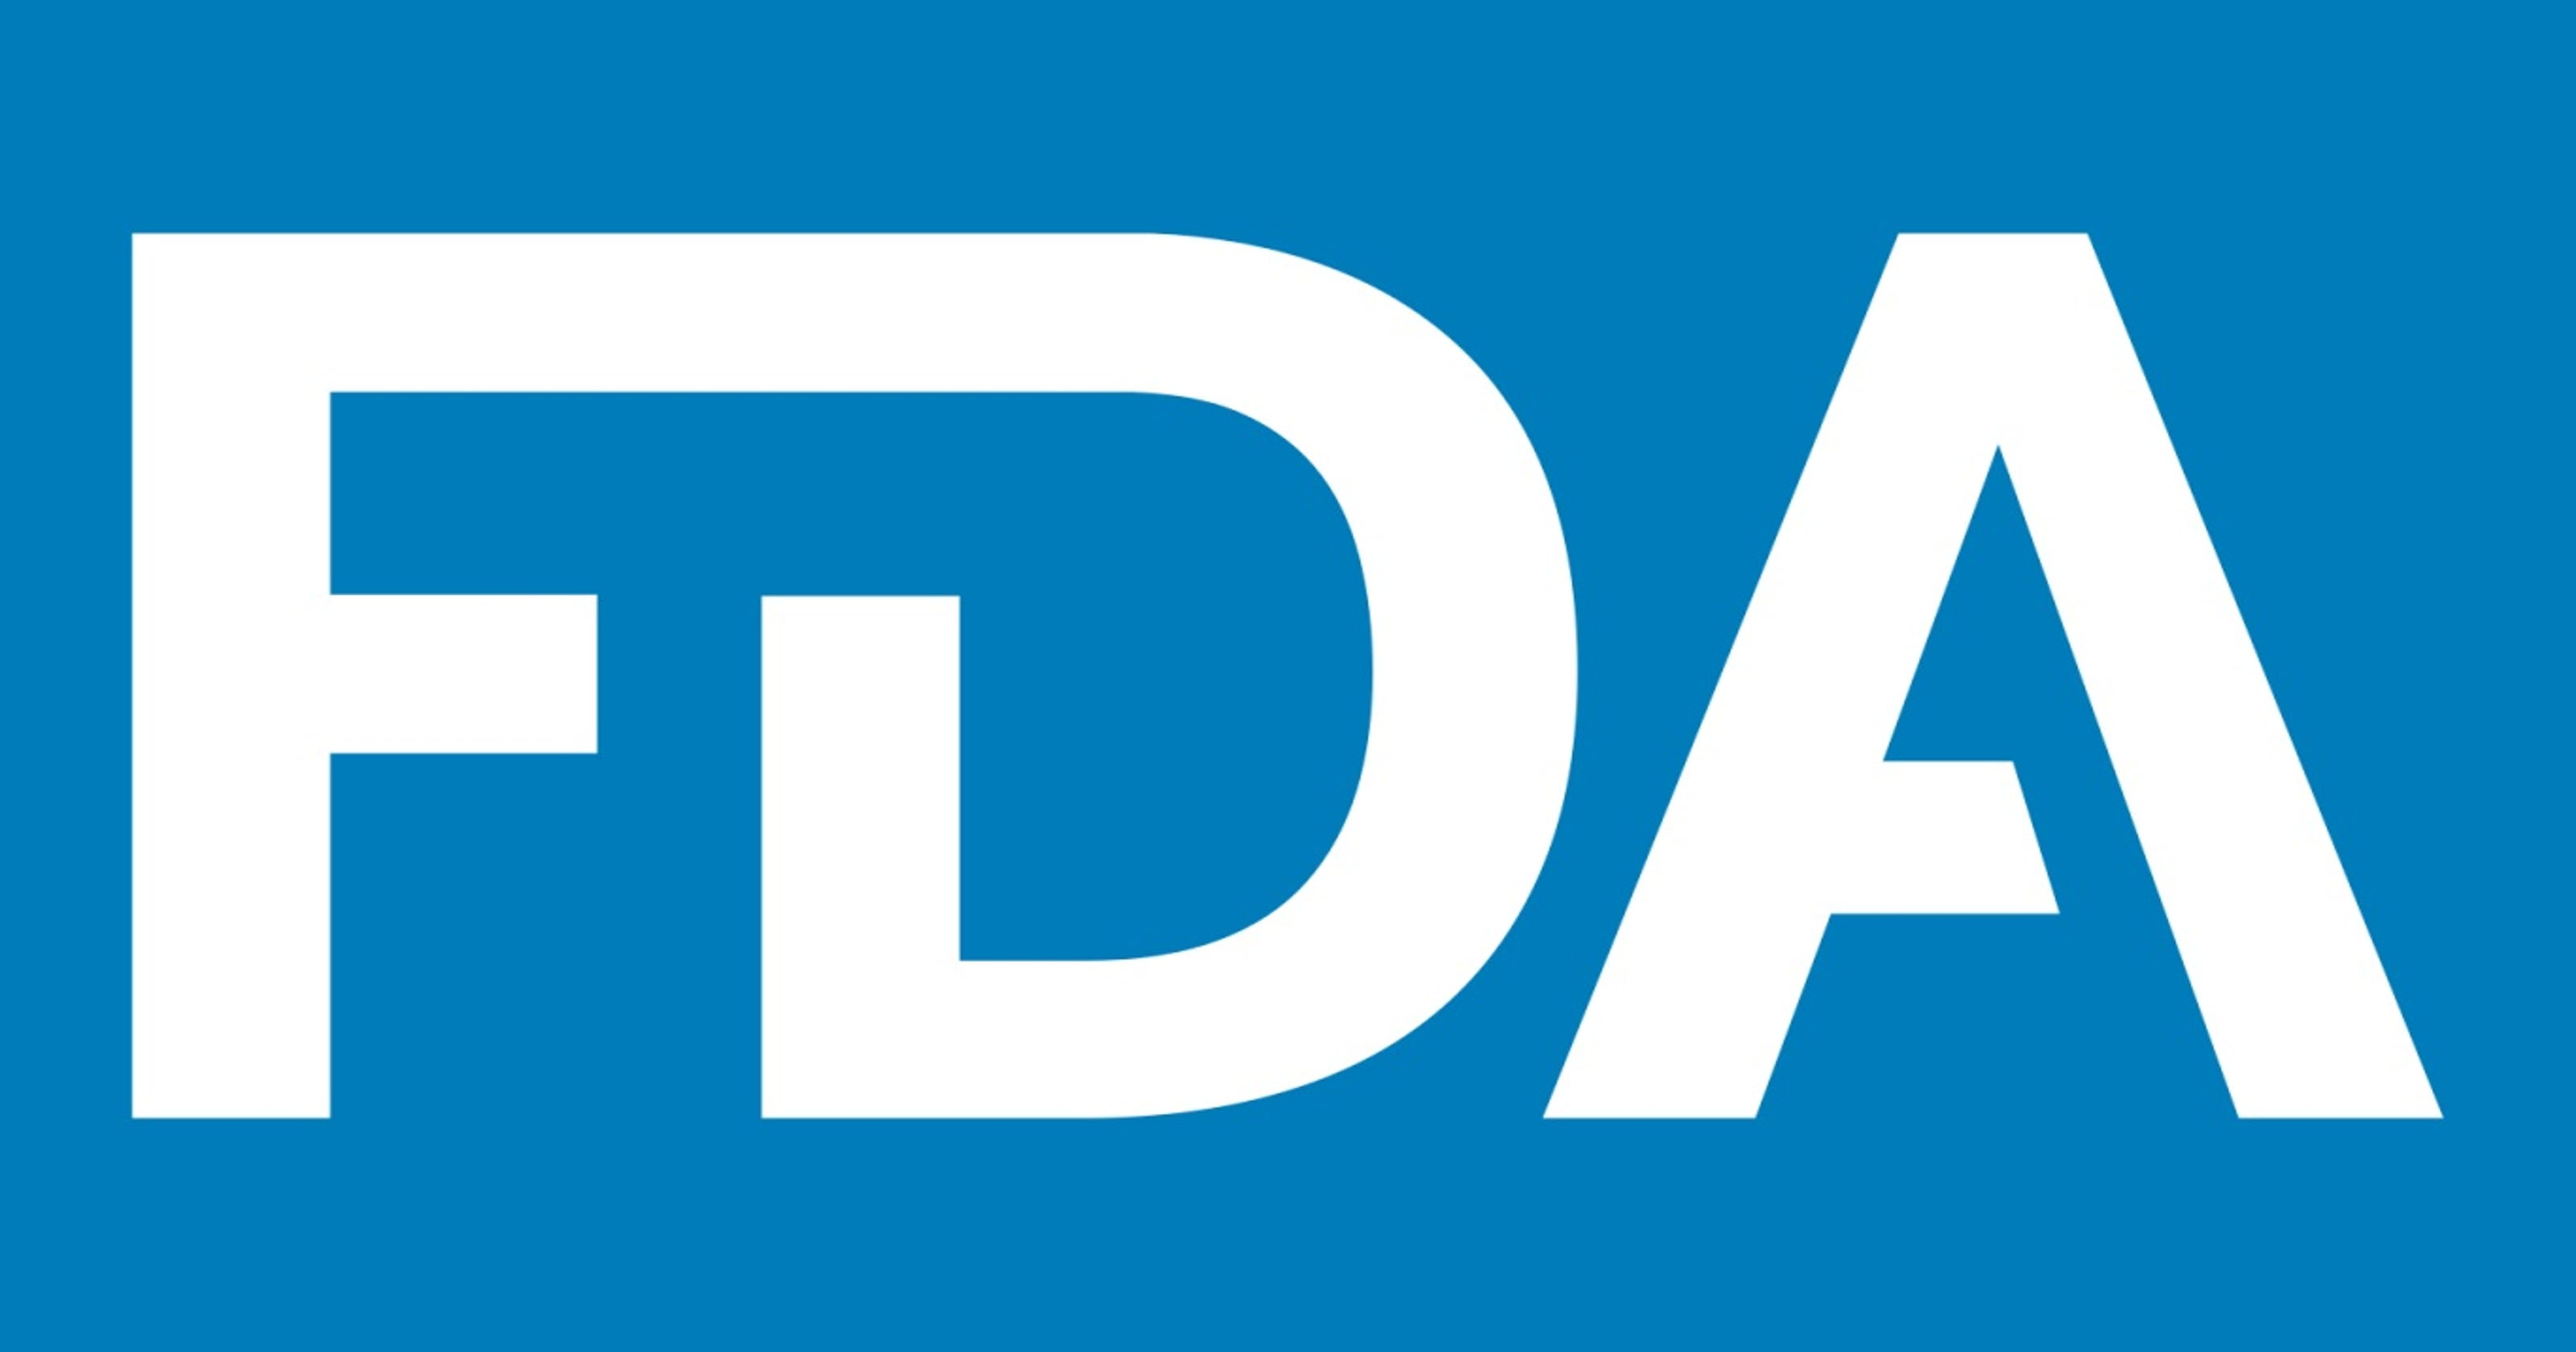 FDA blood pressure drug recall: Tainted losartan OK to take short-term